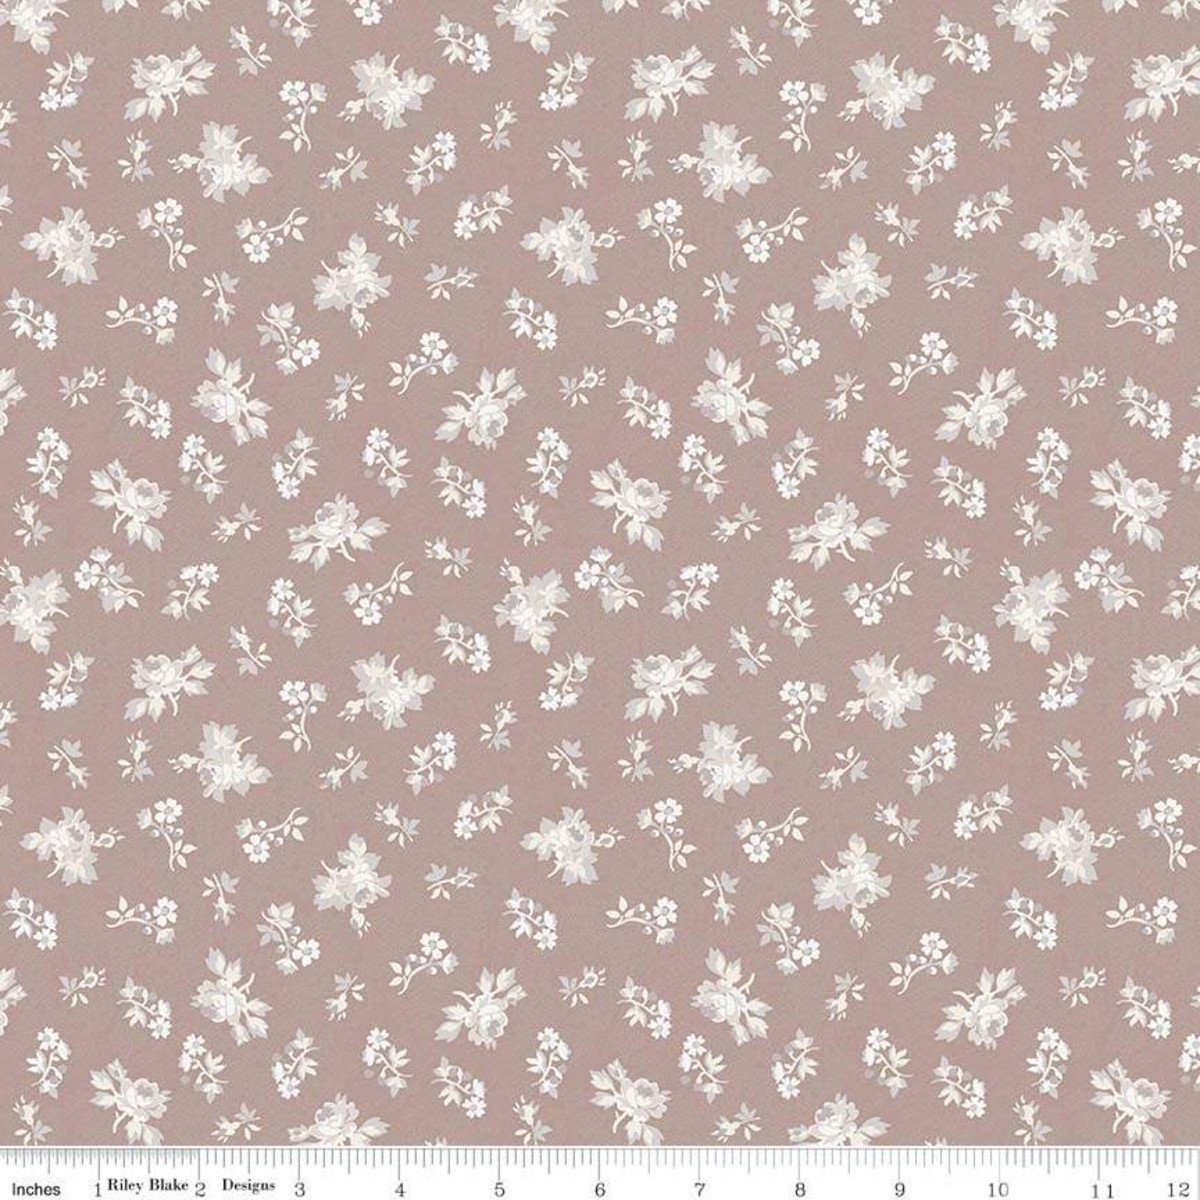 C7683-TAUPE_Floral Rose Garden